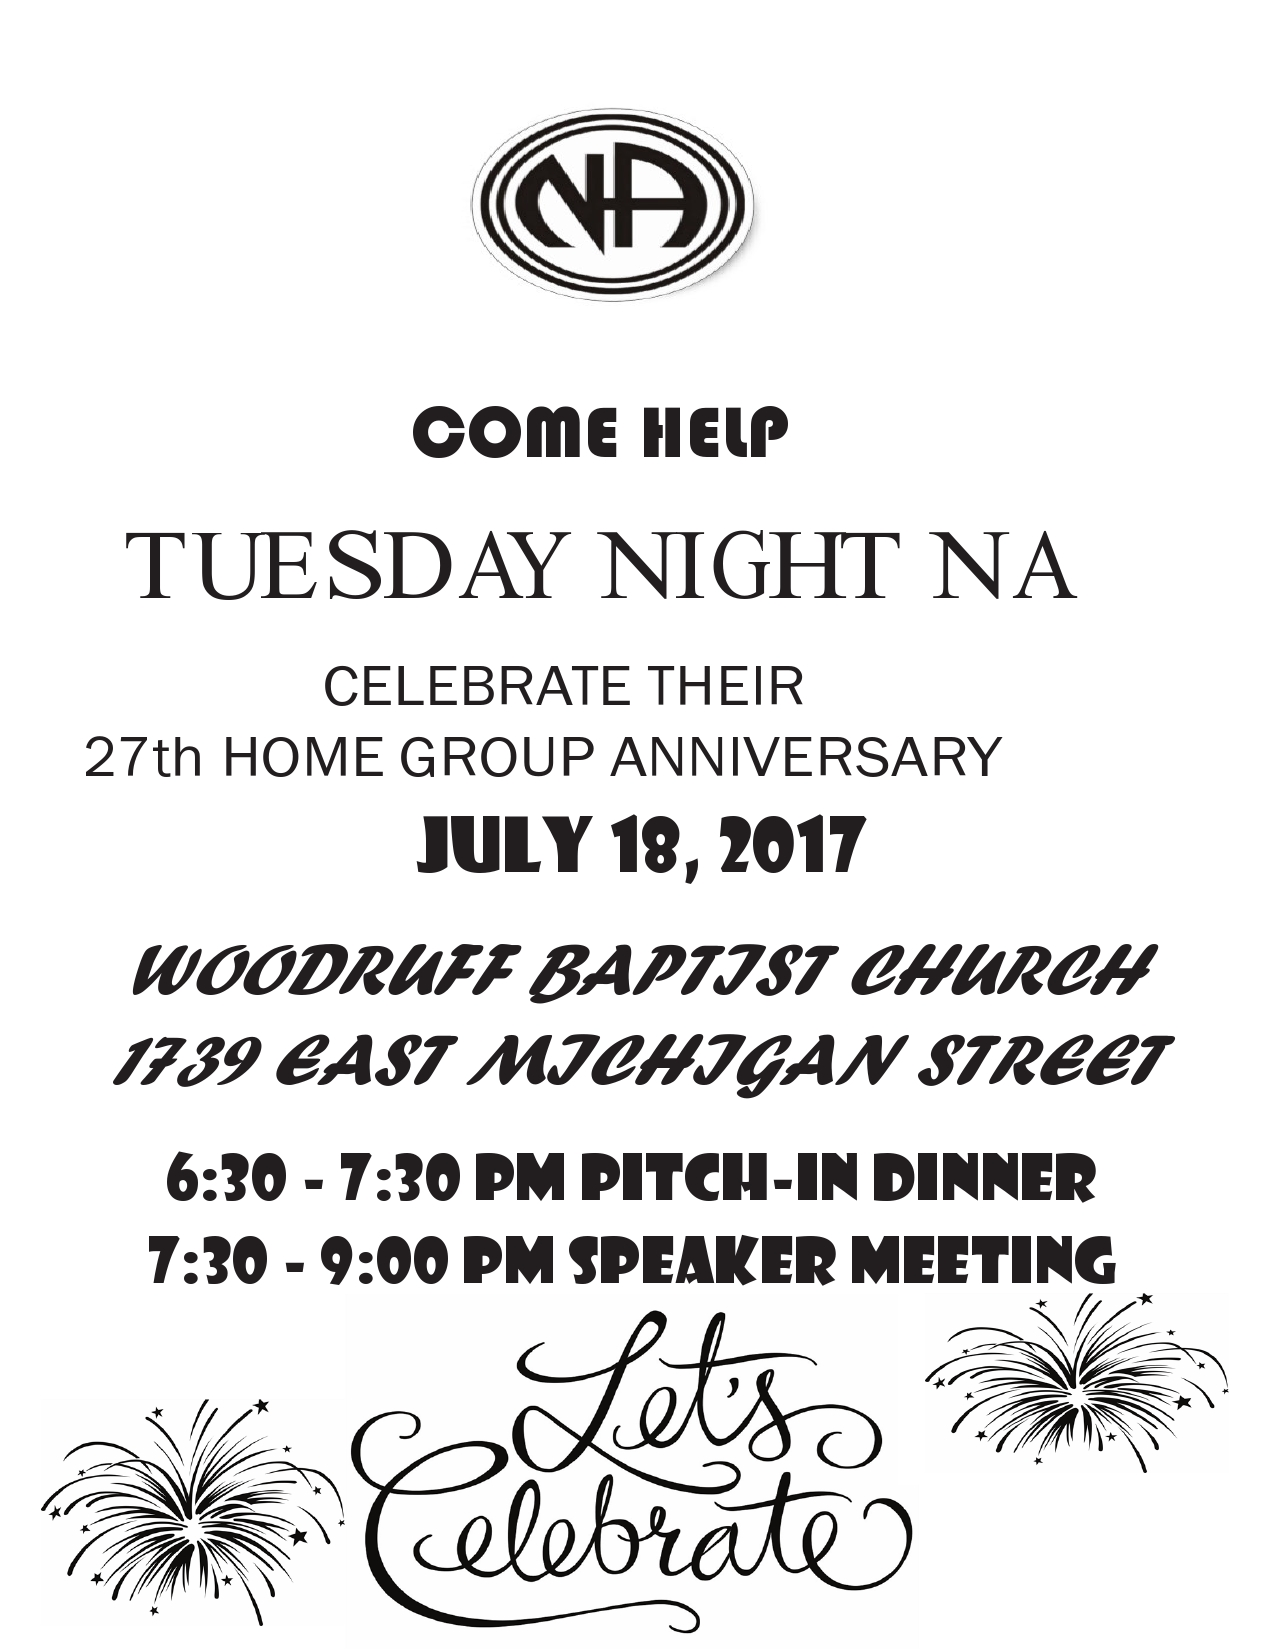 Tuesday Night NA 27th Home Group Anniversary - CIANA